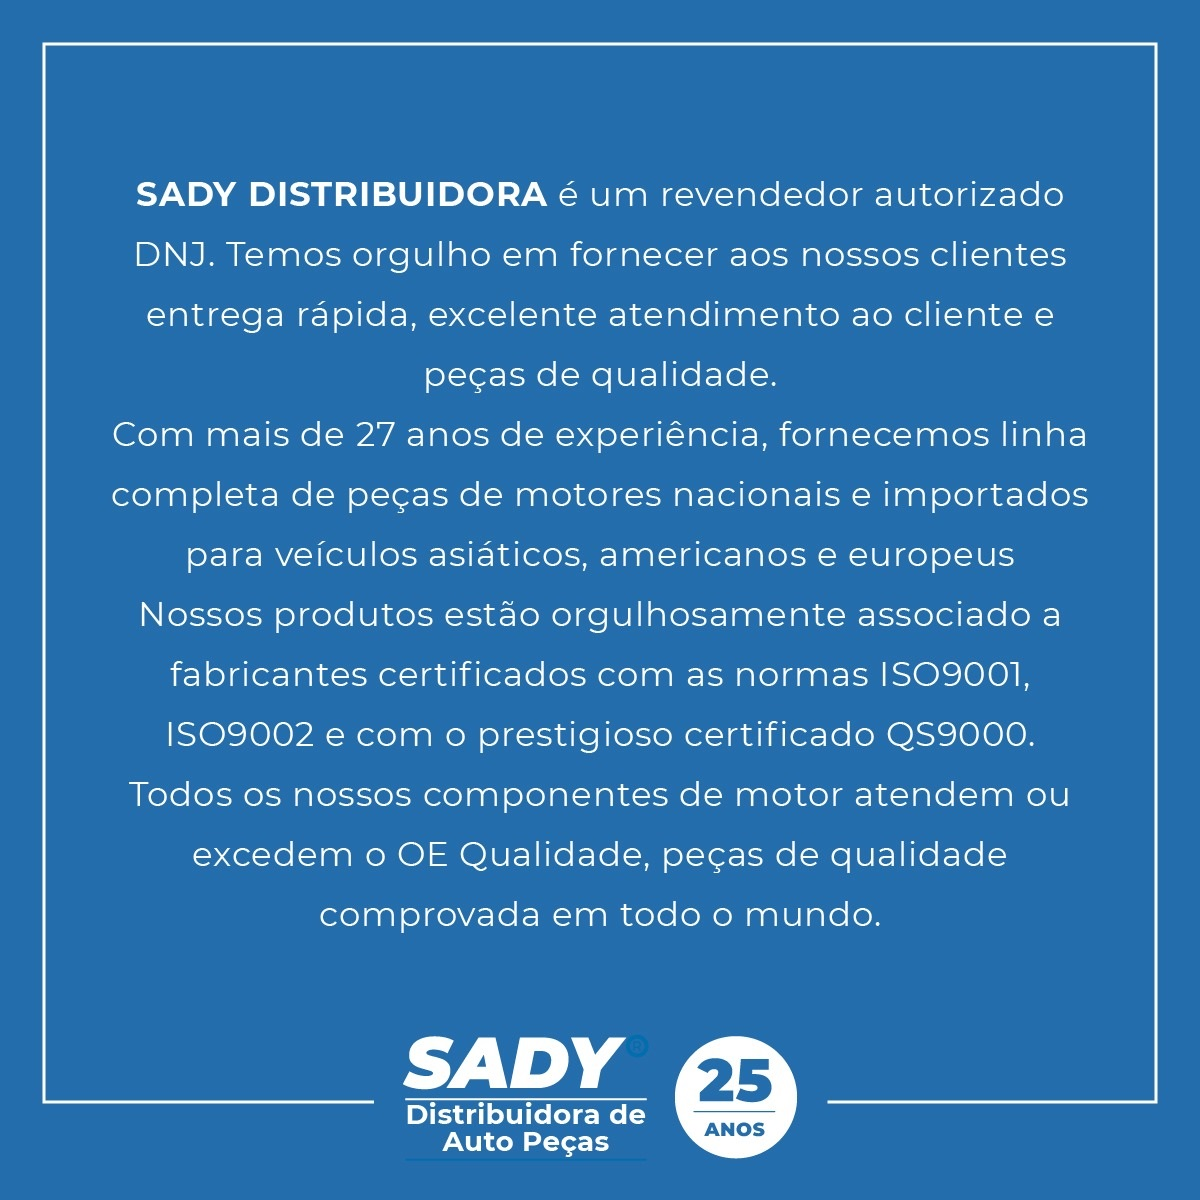 BOMBA DE OLEO DO MOTOR FIAT 2.3 16V TDI